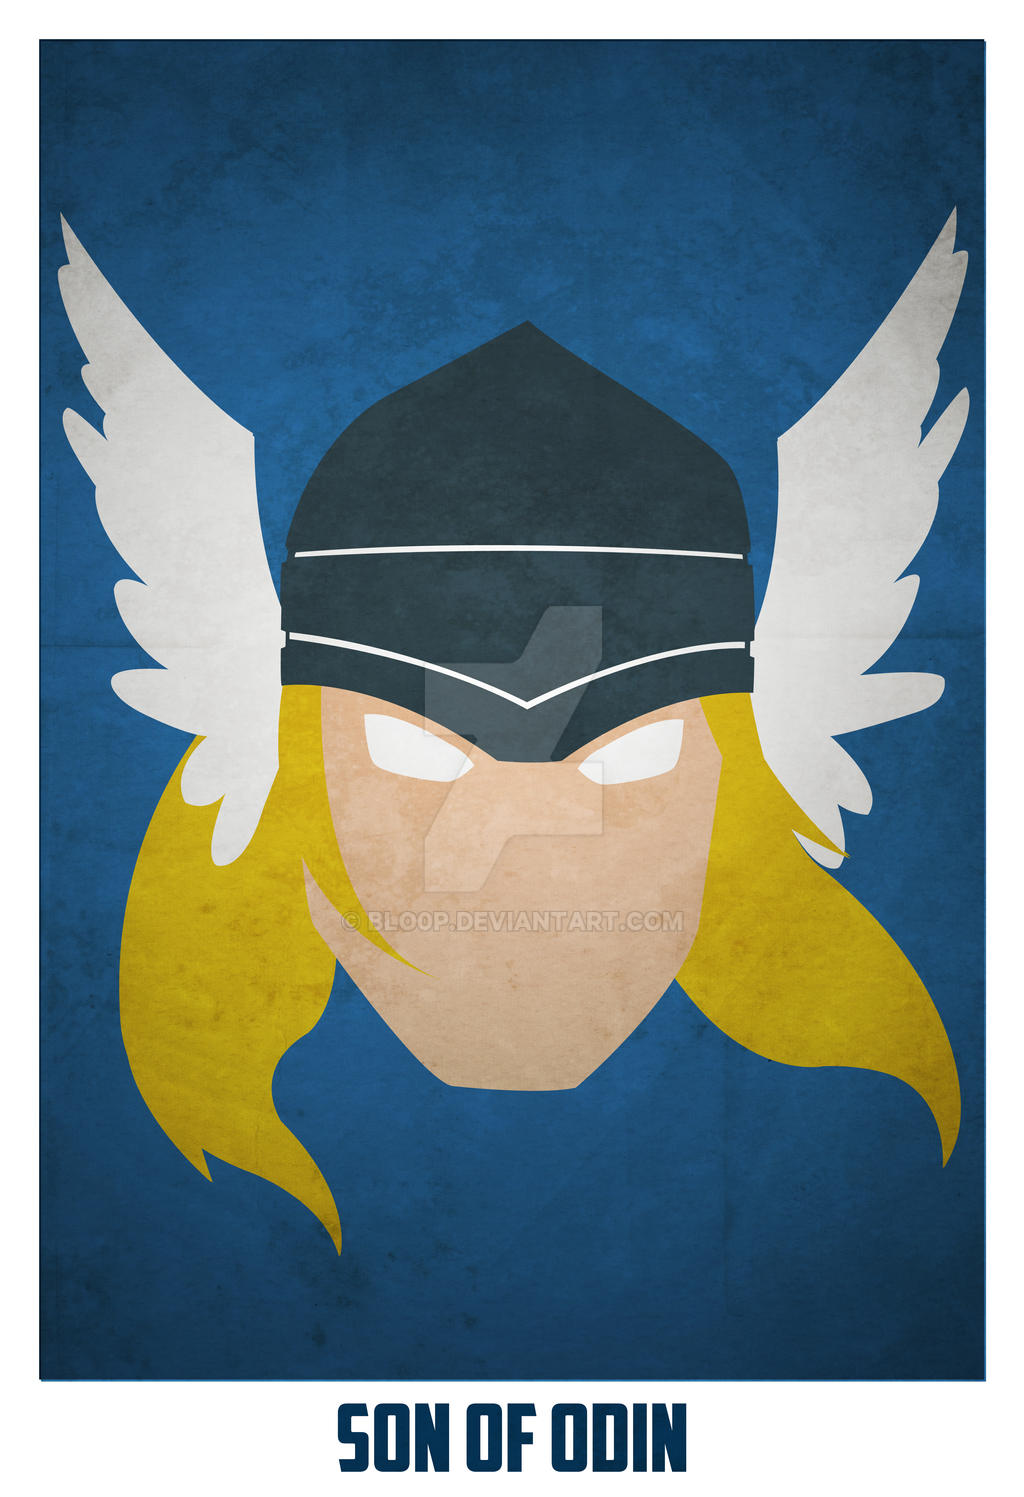 Son of Odin by blo0p